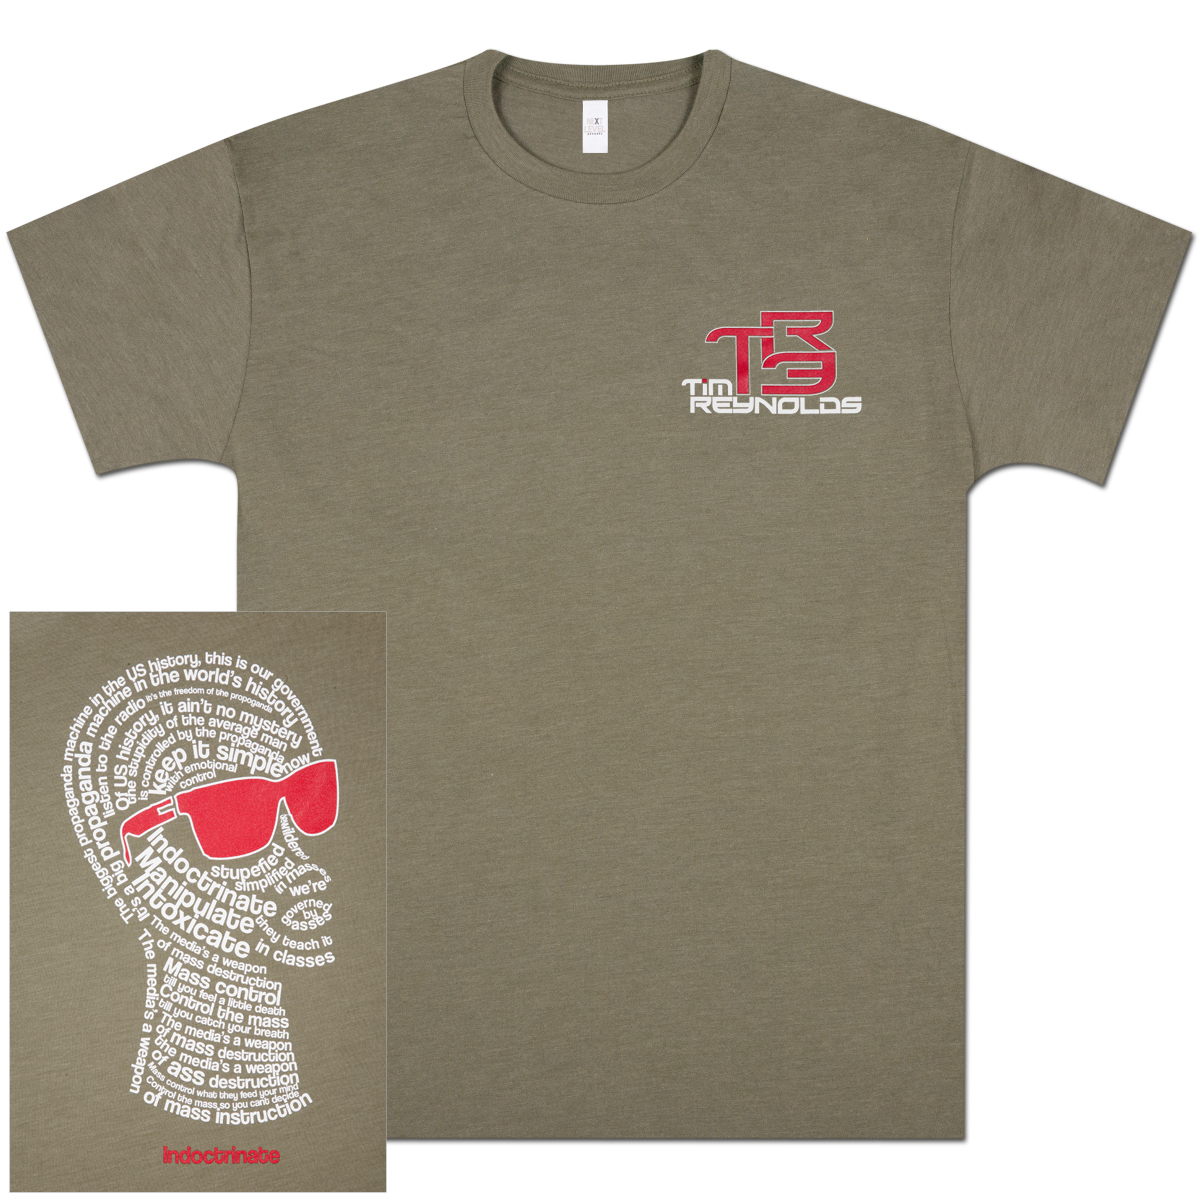 TR3 Filipo Short Sleeve T-Shirt - Olive Green